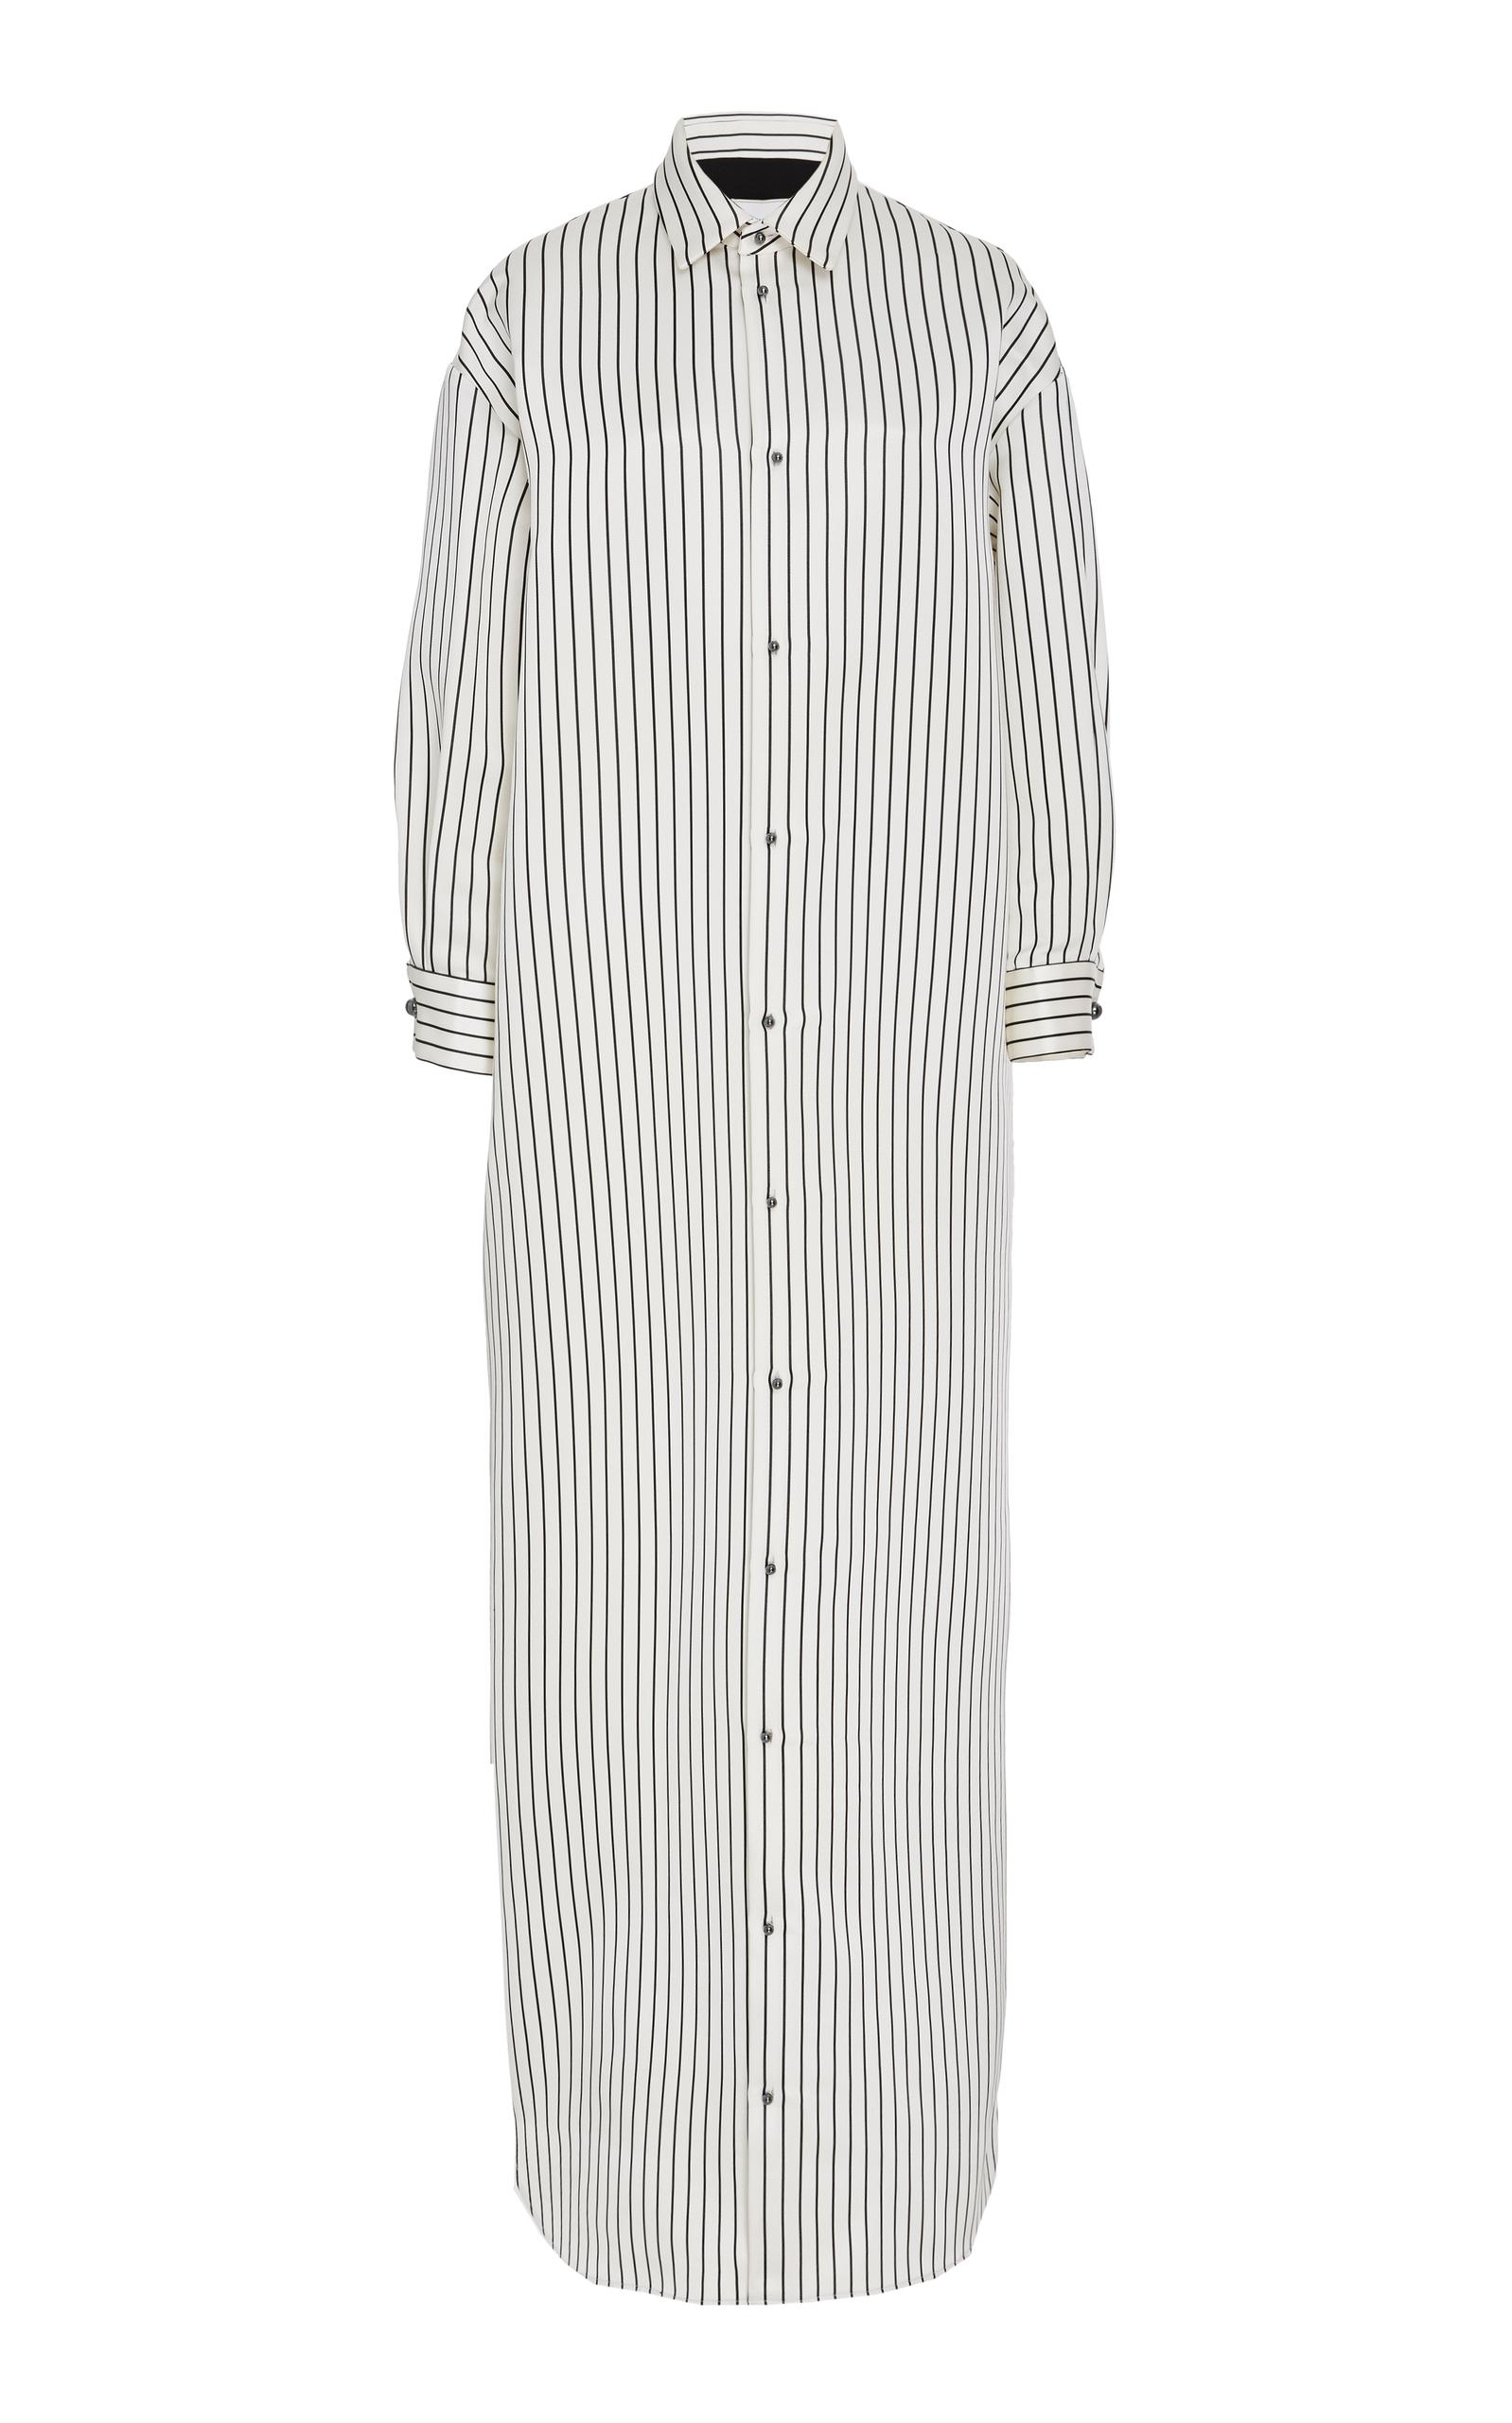 ESME VIE M'O Exclusive Capri Striped Satin Dress